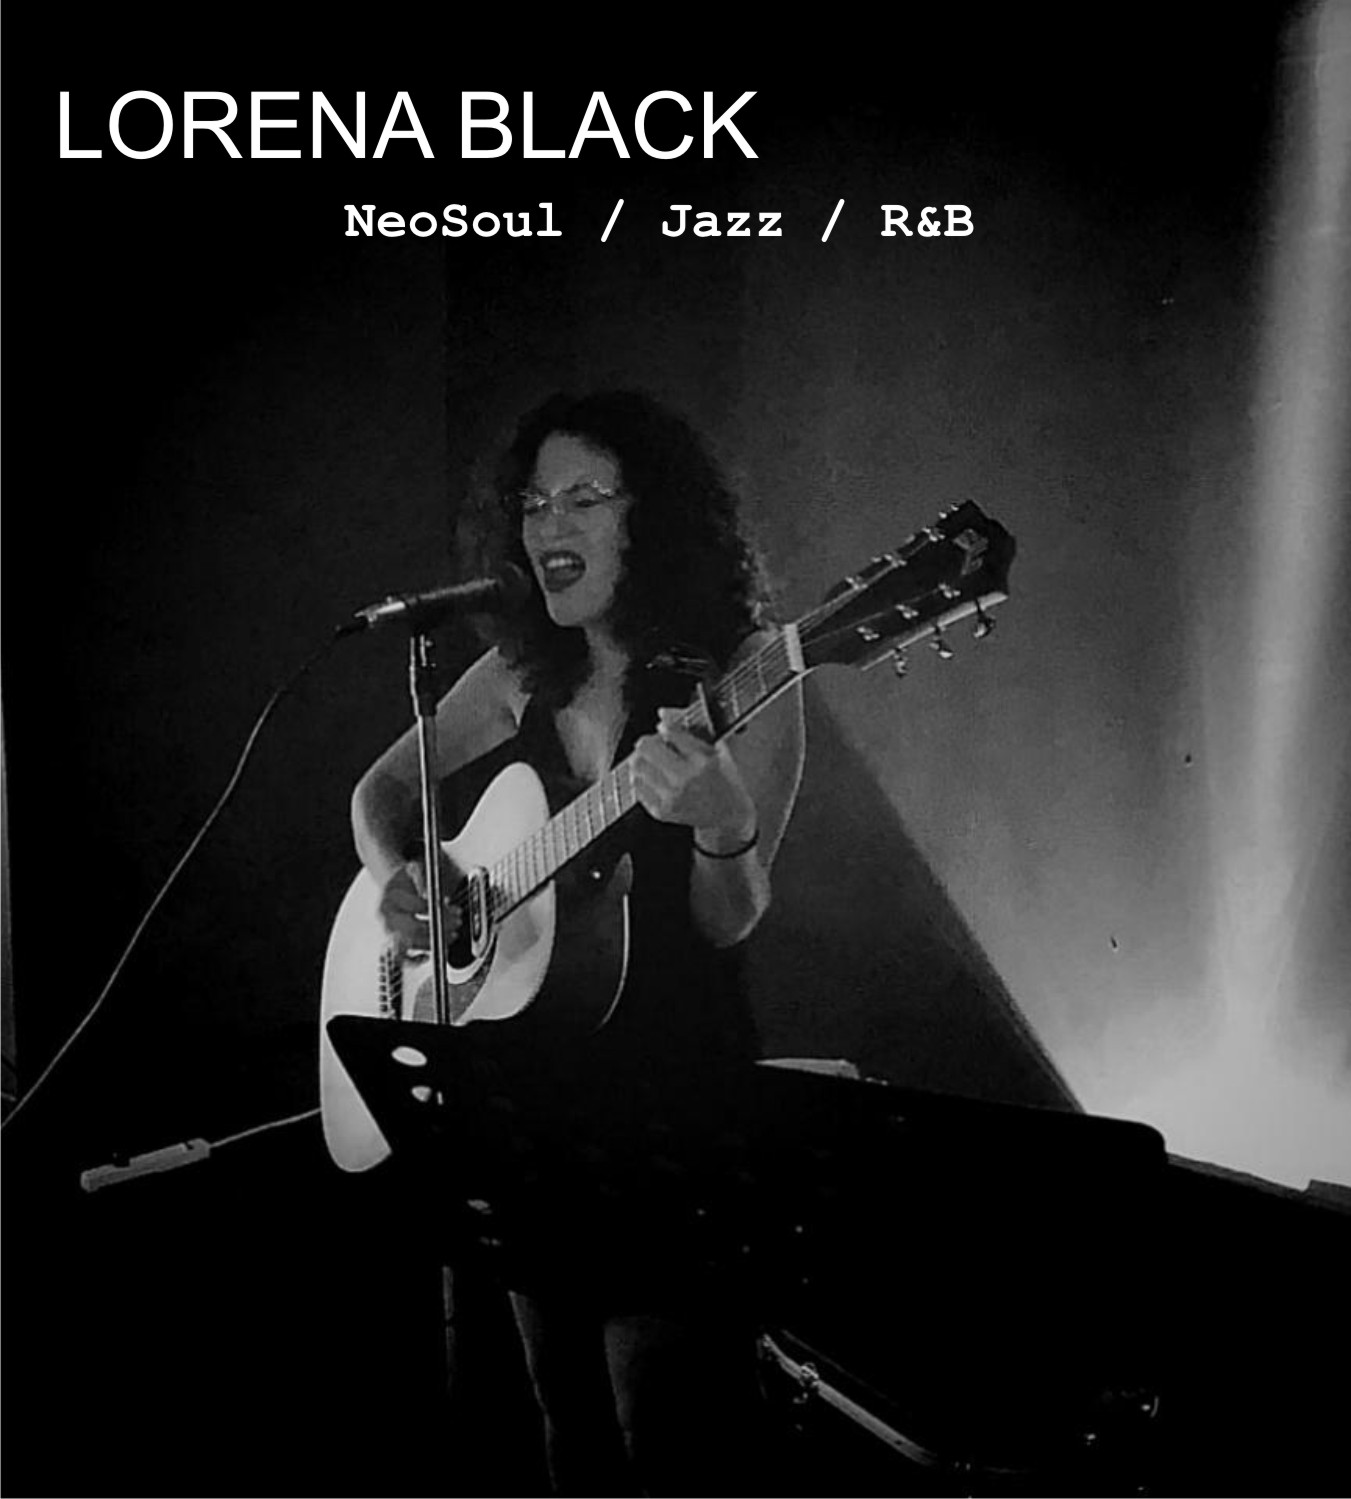 LORENA BLACK